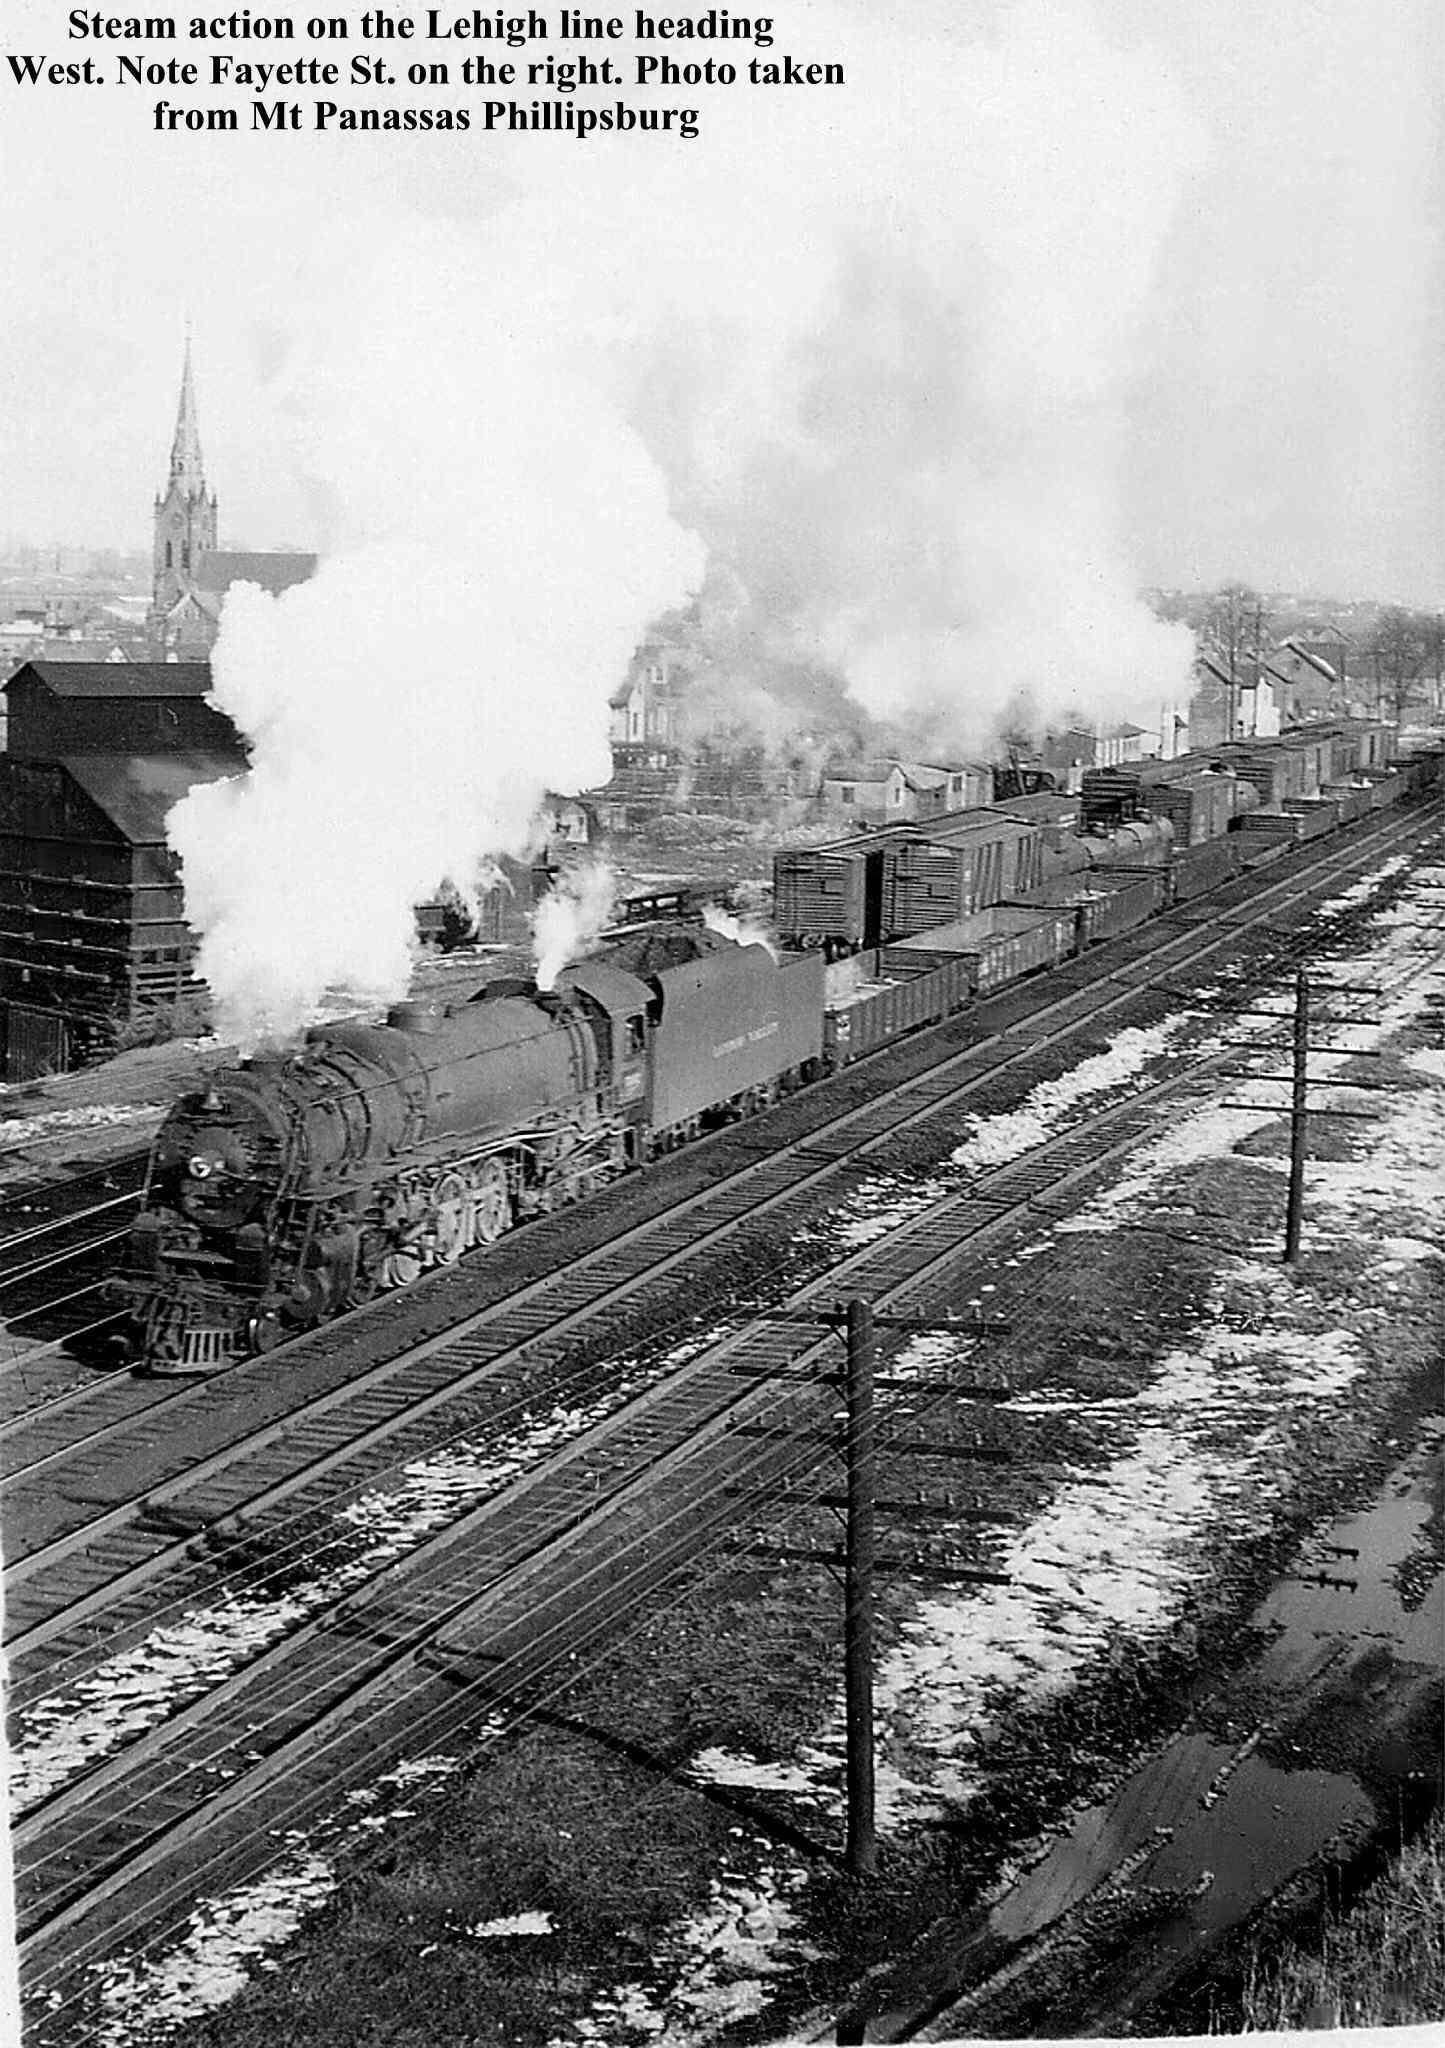 Phillipsburg, N.J. Yard